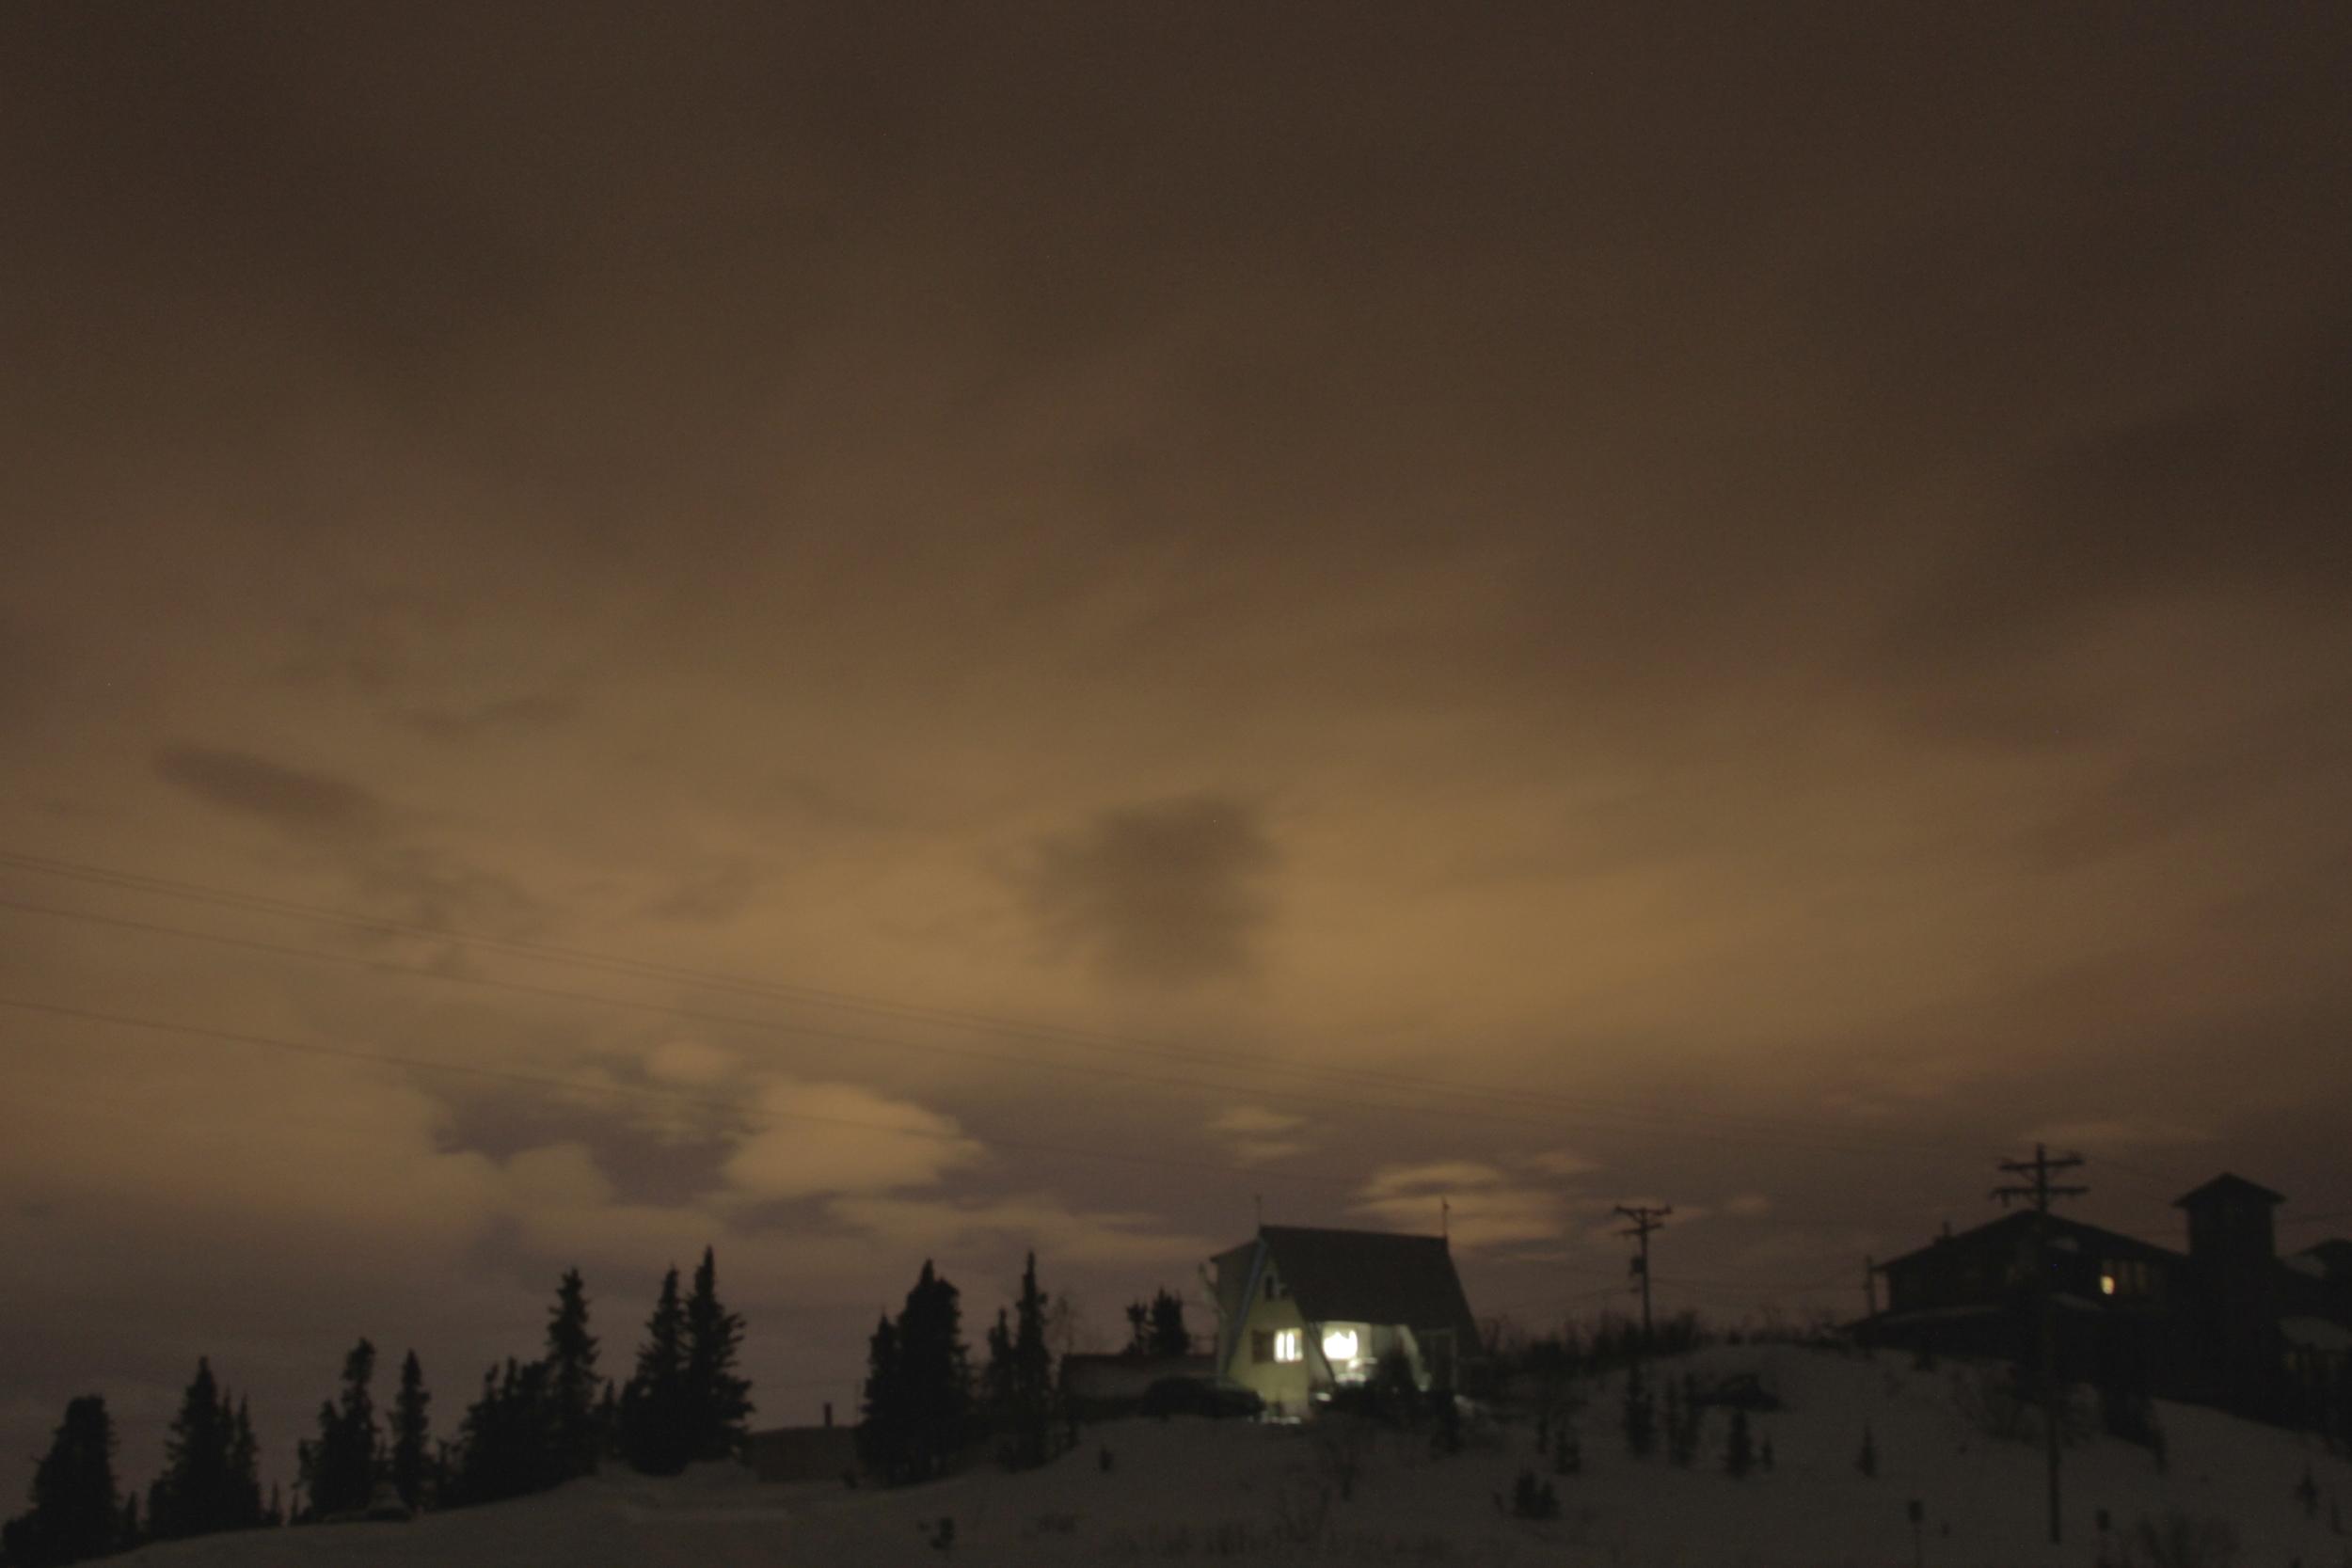 Mountain_House.JPG